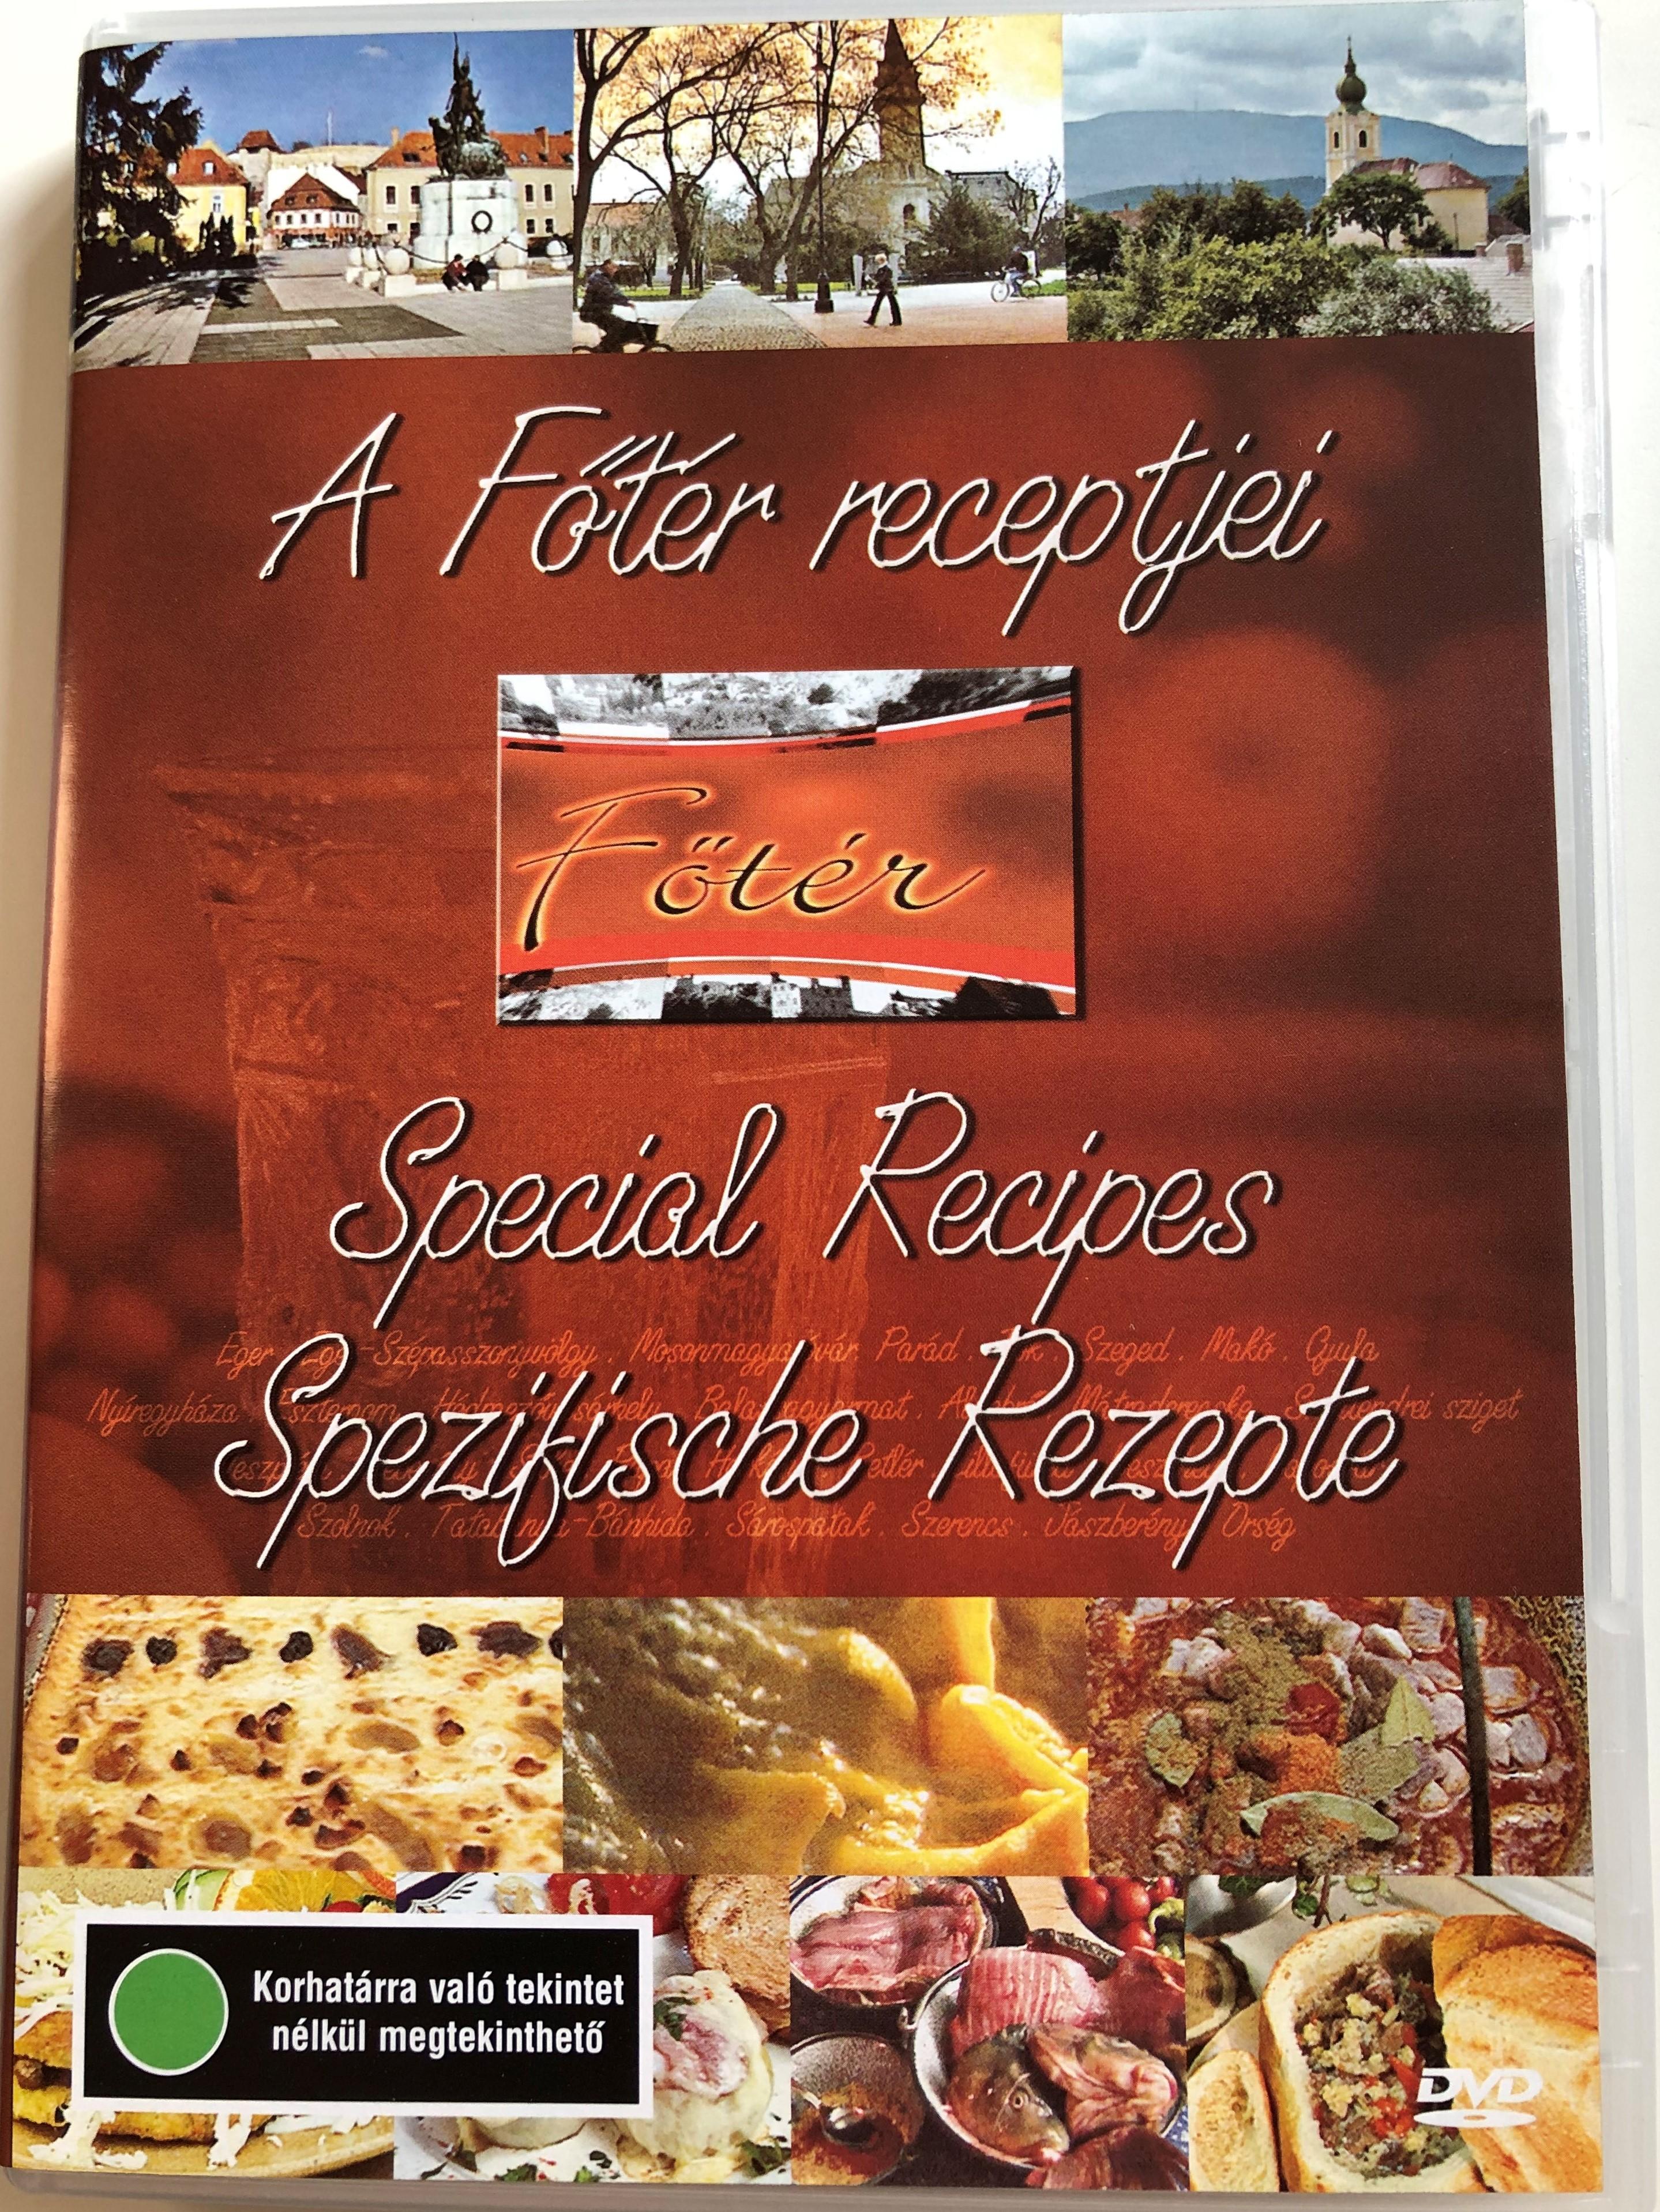 a-f-t-r-receptjei-dvd-special-recipes-spezifische-rezepte-directed-by-gnes-csenterics-1.jpg